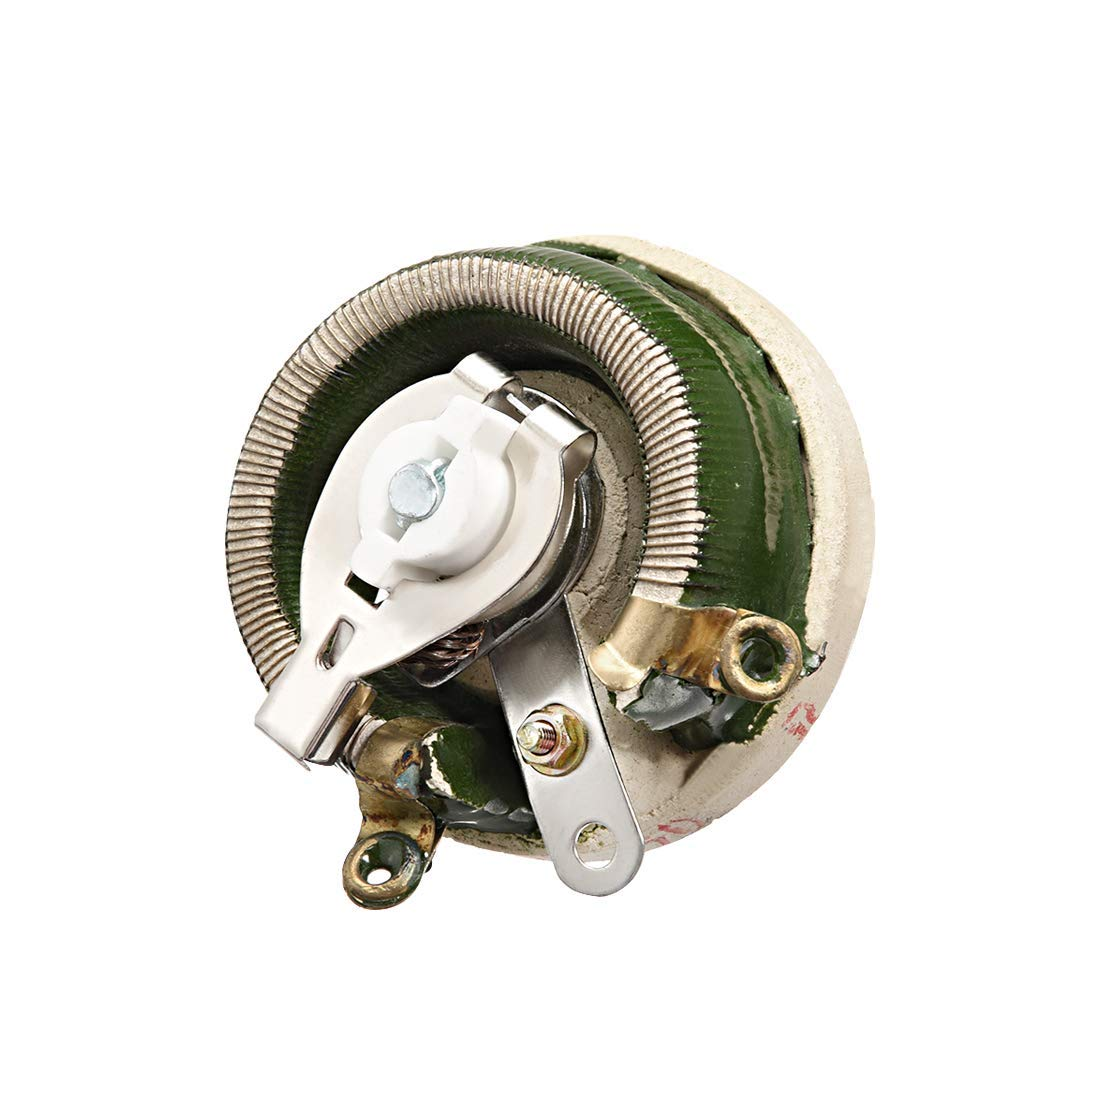 uxcell 200 Ohm 100W High Power Ceramic Wirewound Potentiometer Rheostat Variable